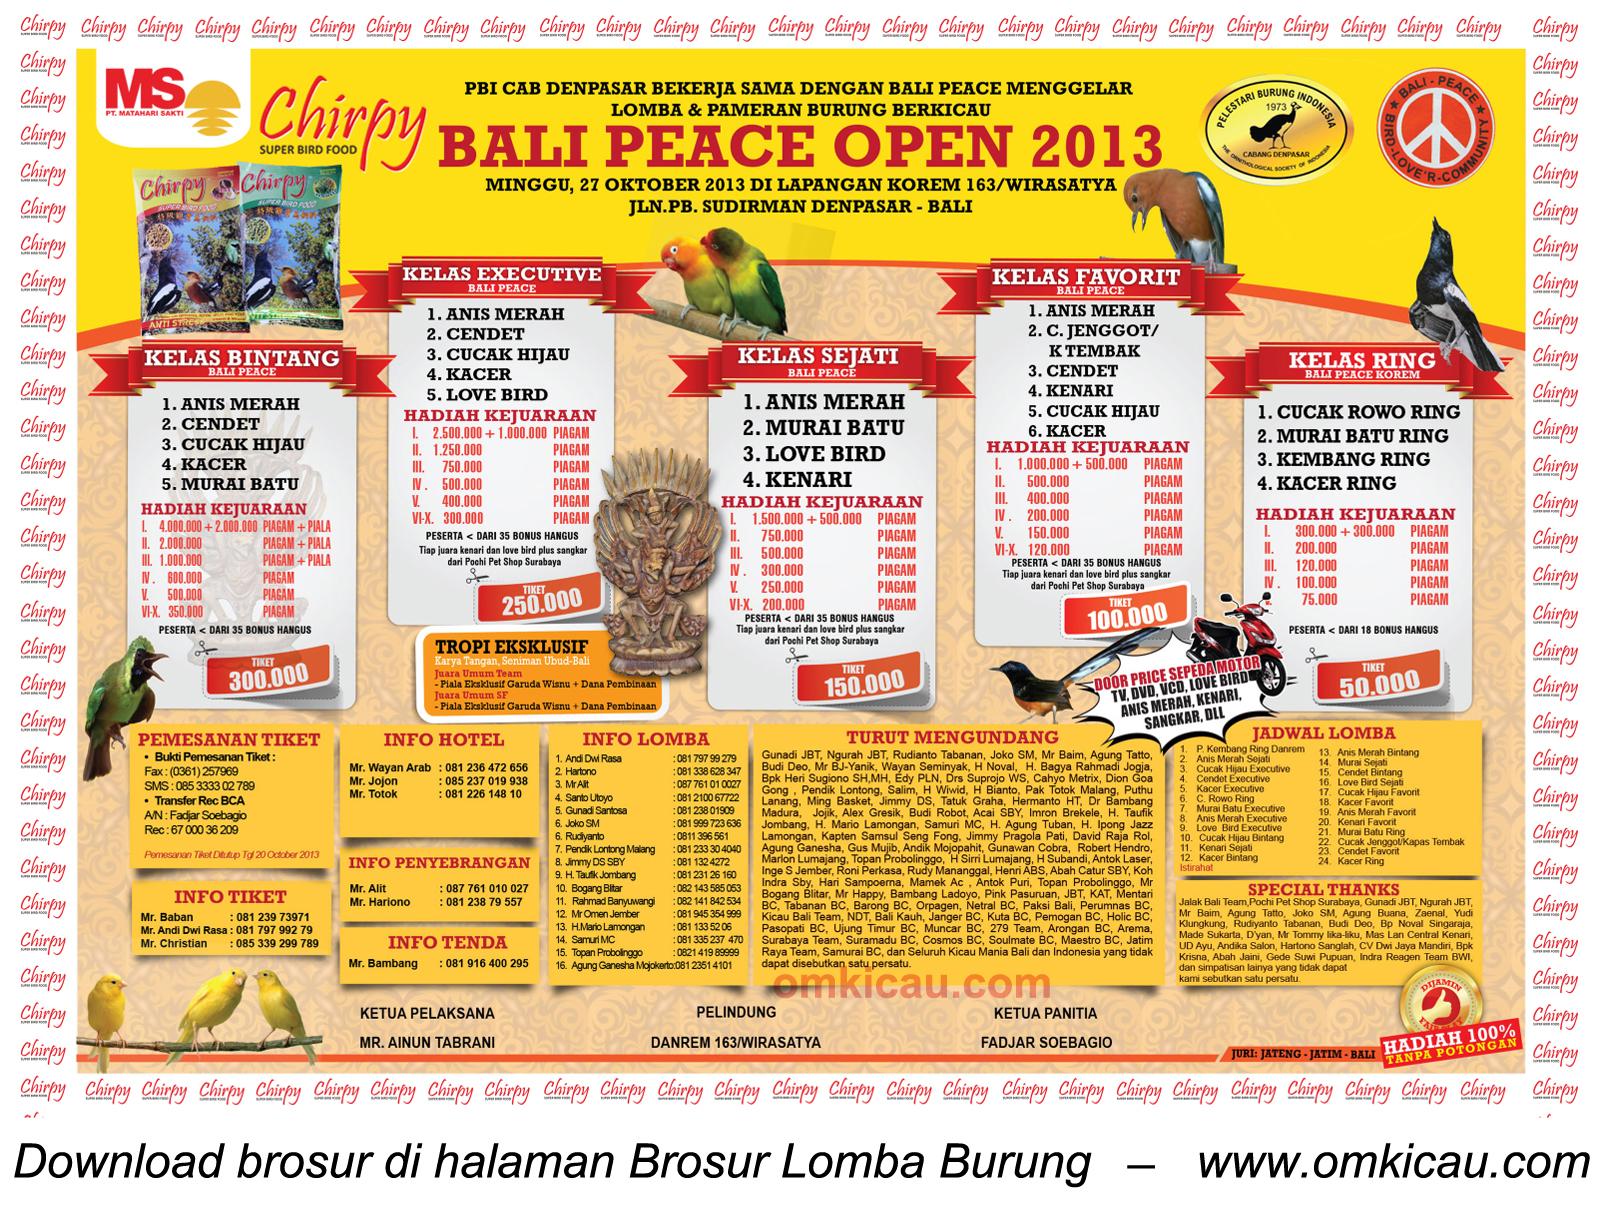 Brosur Lomba Burung Bali Peace Open, Denpasar, 27 Oktober 2013